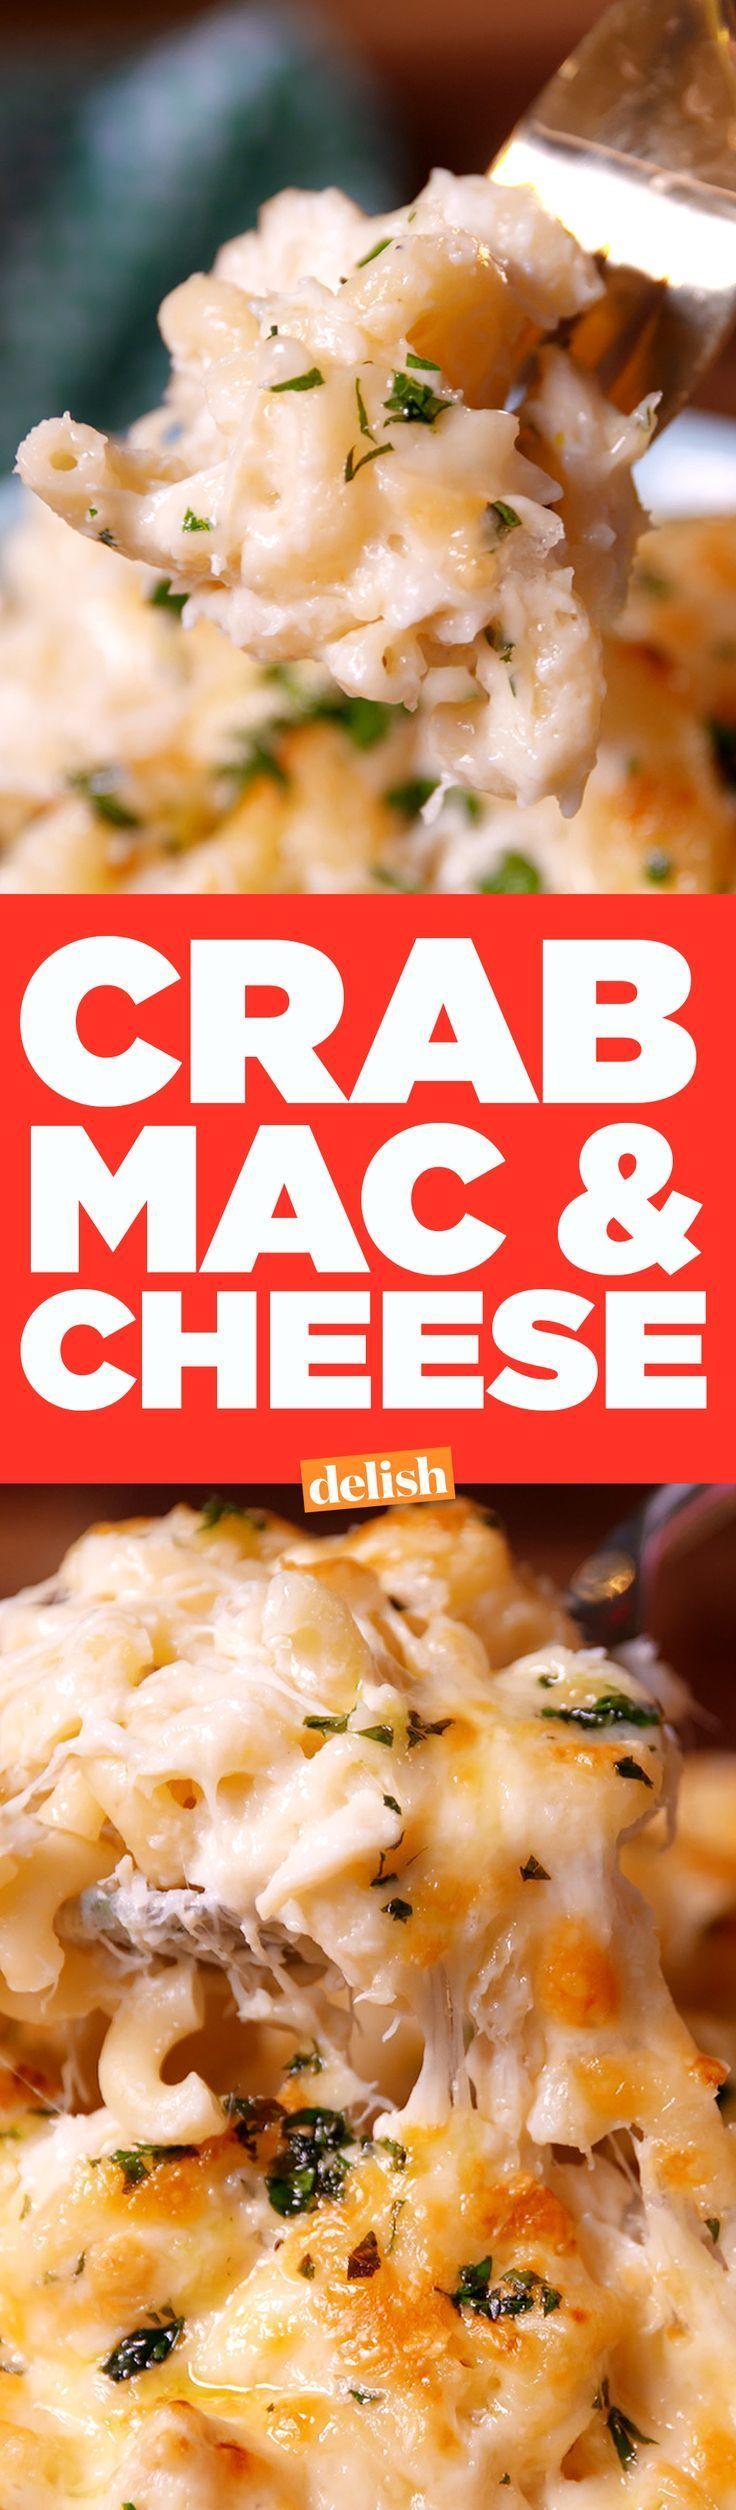 Crab Mac & Cheese